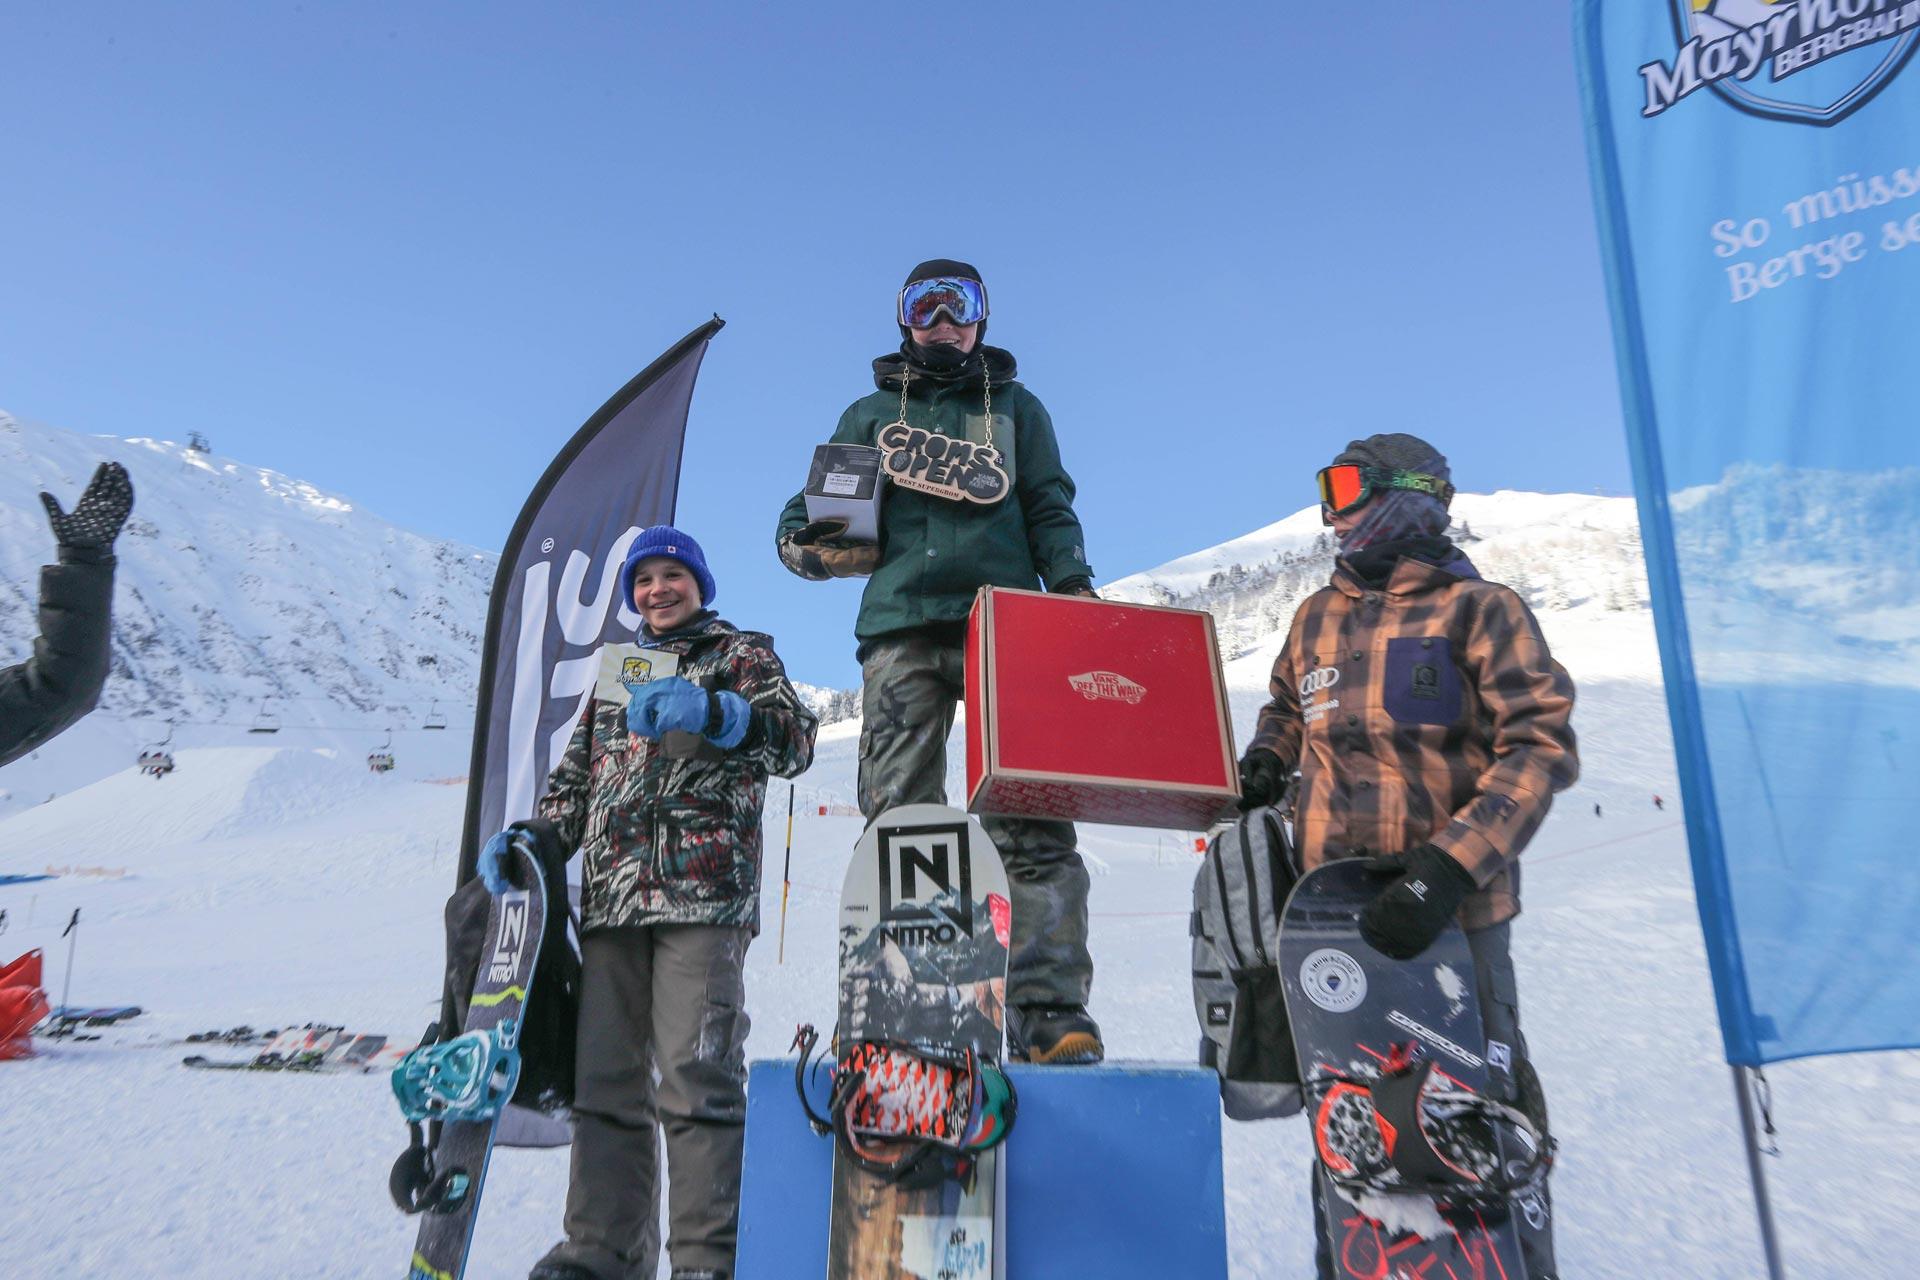 Top 3 Supergroms: Paul Frischhut, Niklas Huber, Mark Schrott (v.l.n.r.)